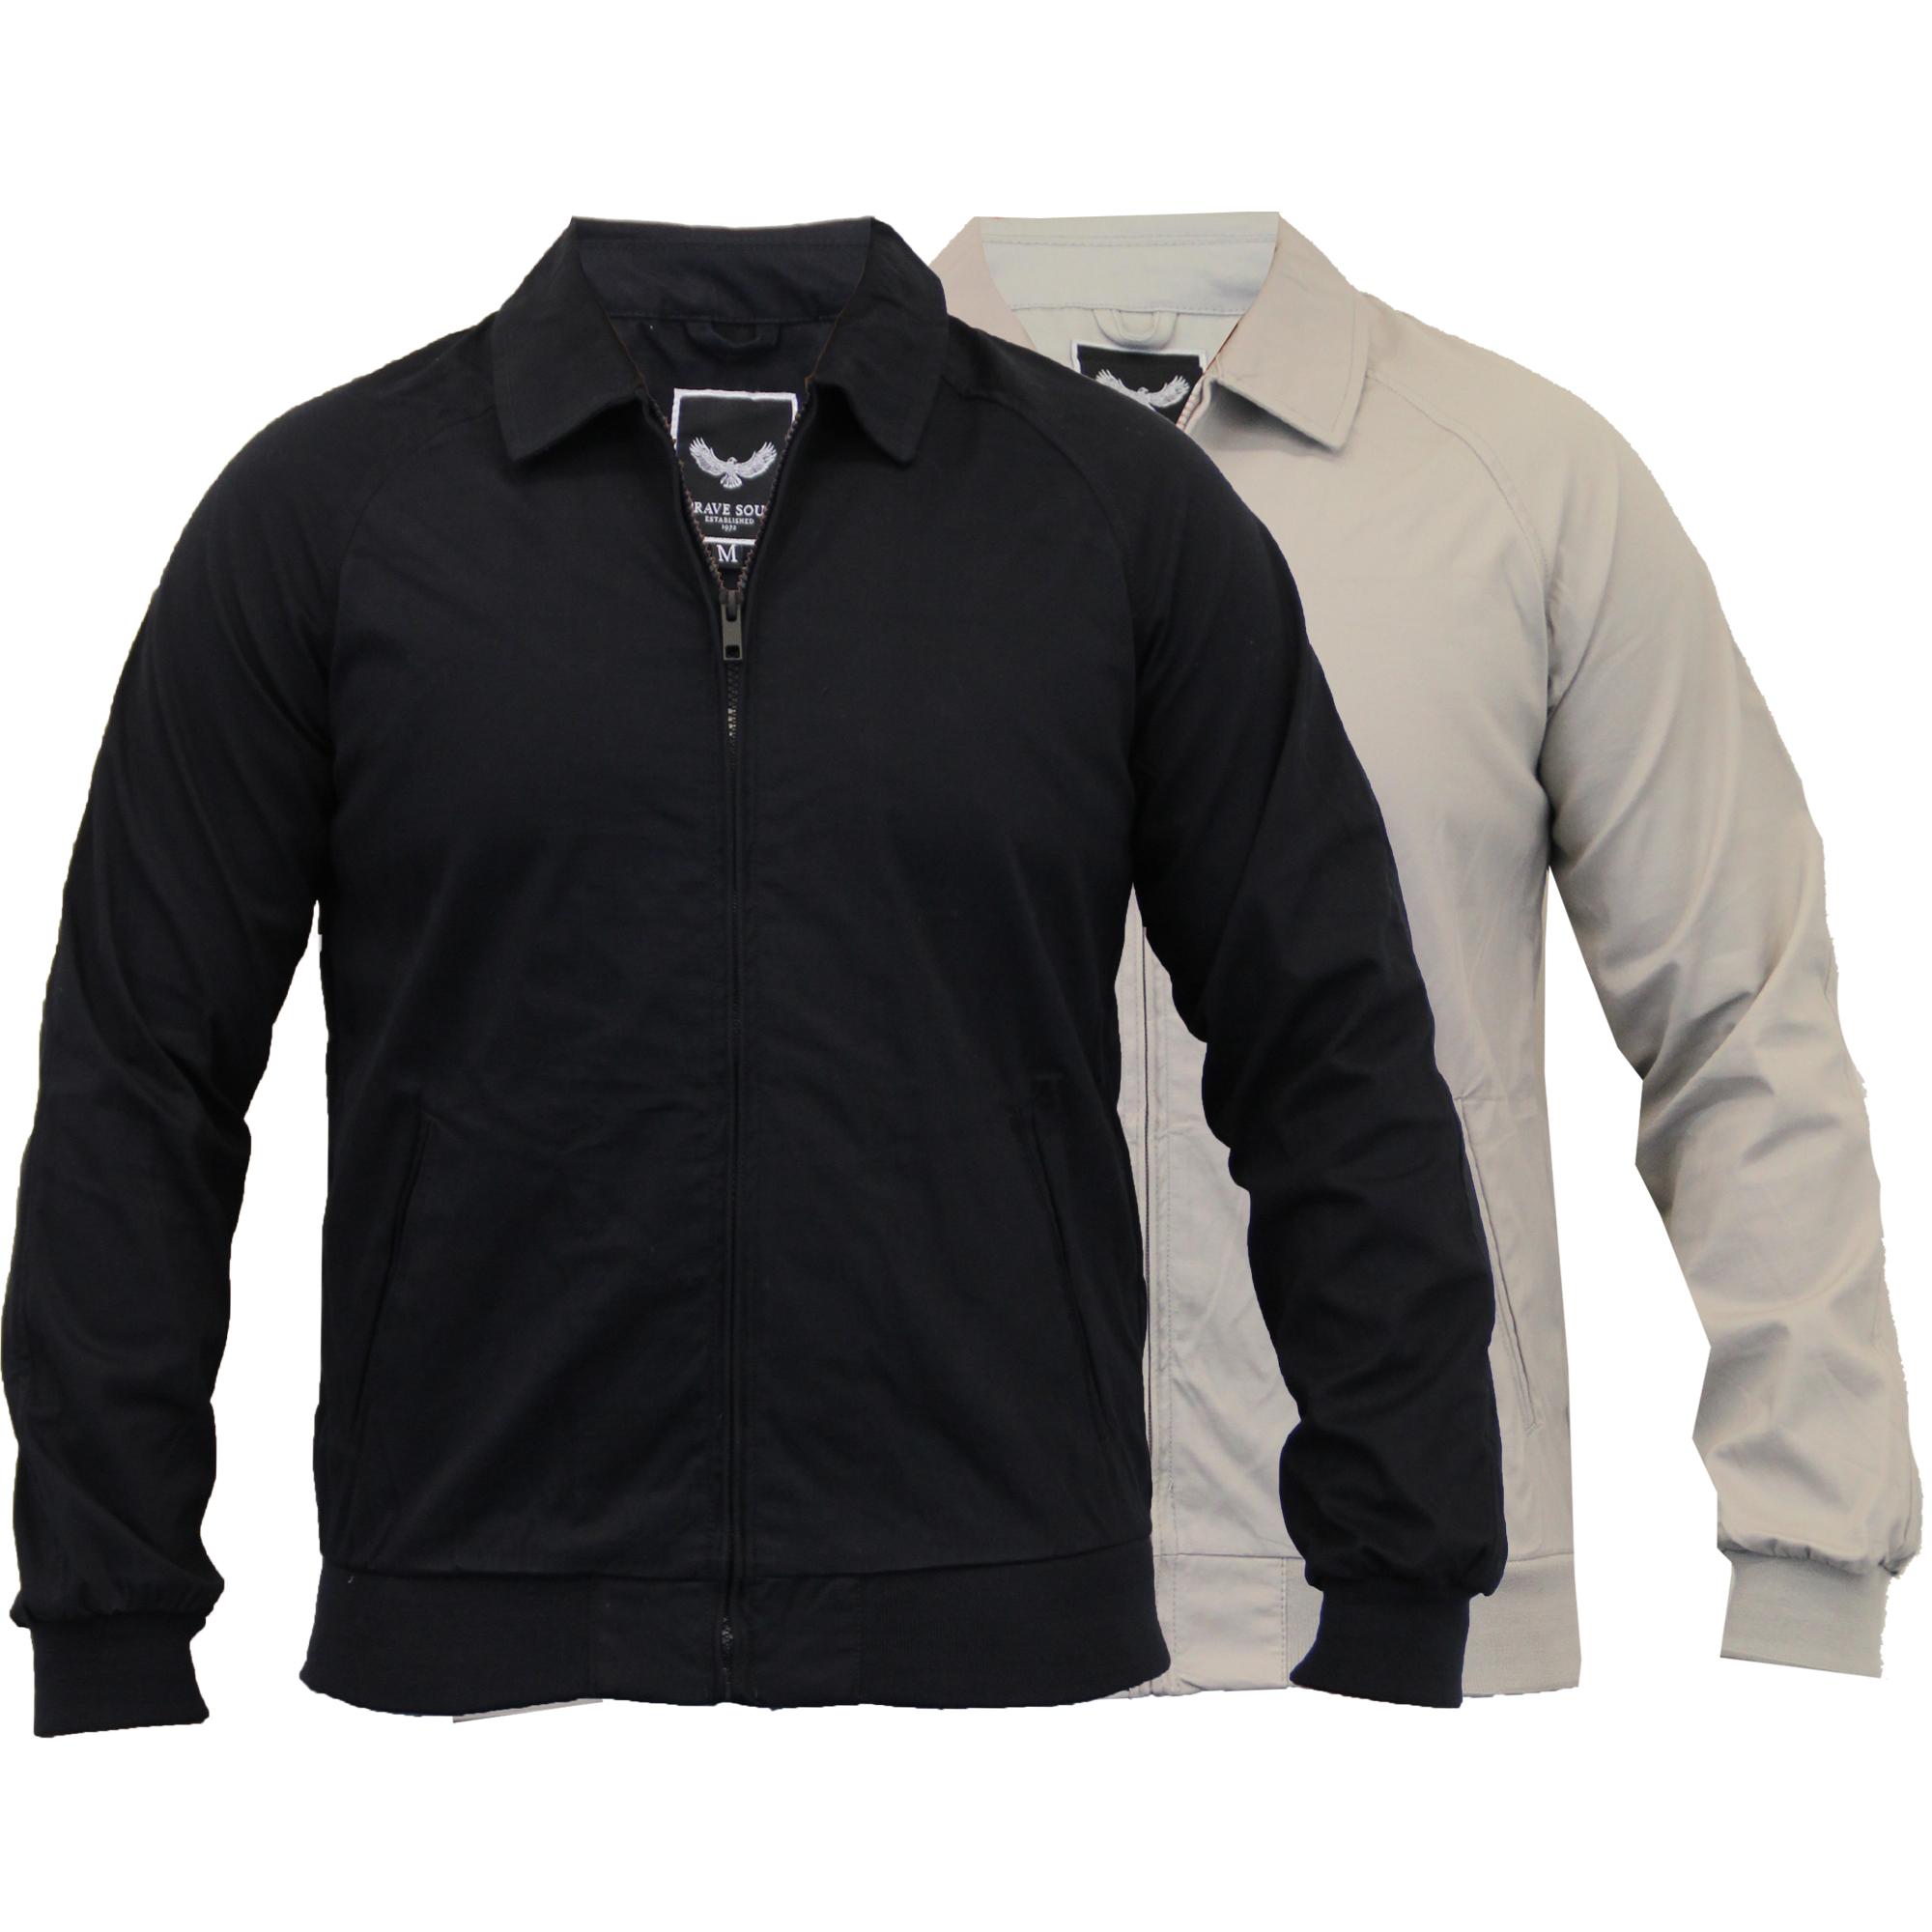 Mens jacket cotton - Mens Jacket Brave Soul Coat Harrington Vintage Bomber